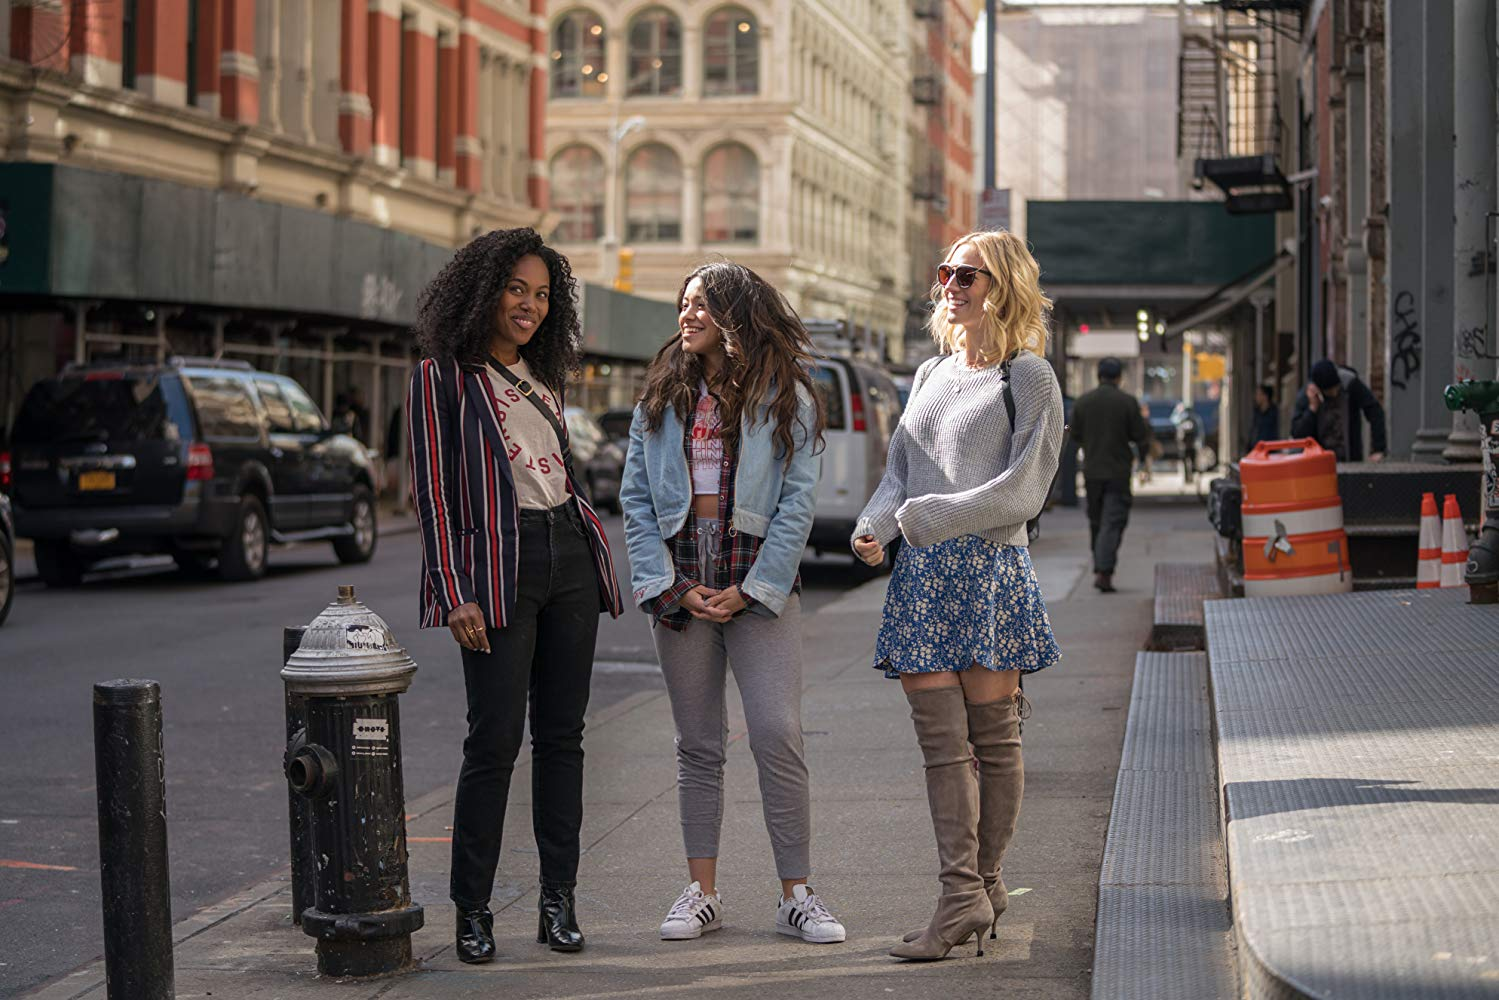 DeWanda Wise, Gina Rodriguez, and Brittany Snow in Someone Great | IMDb